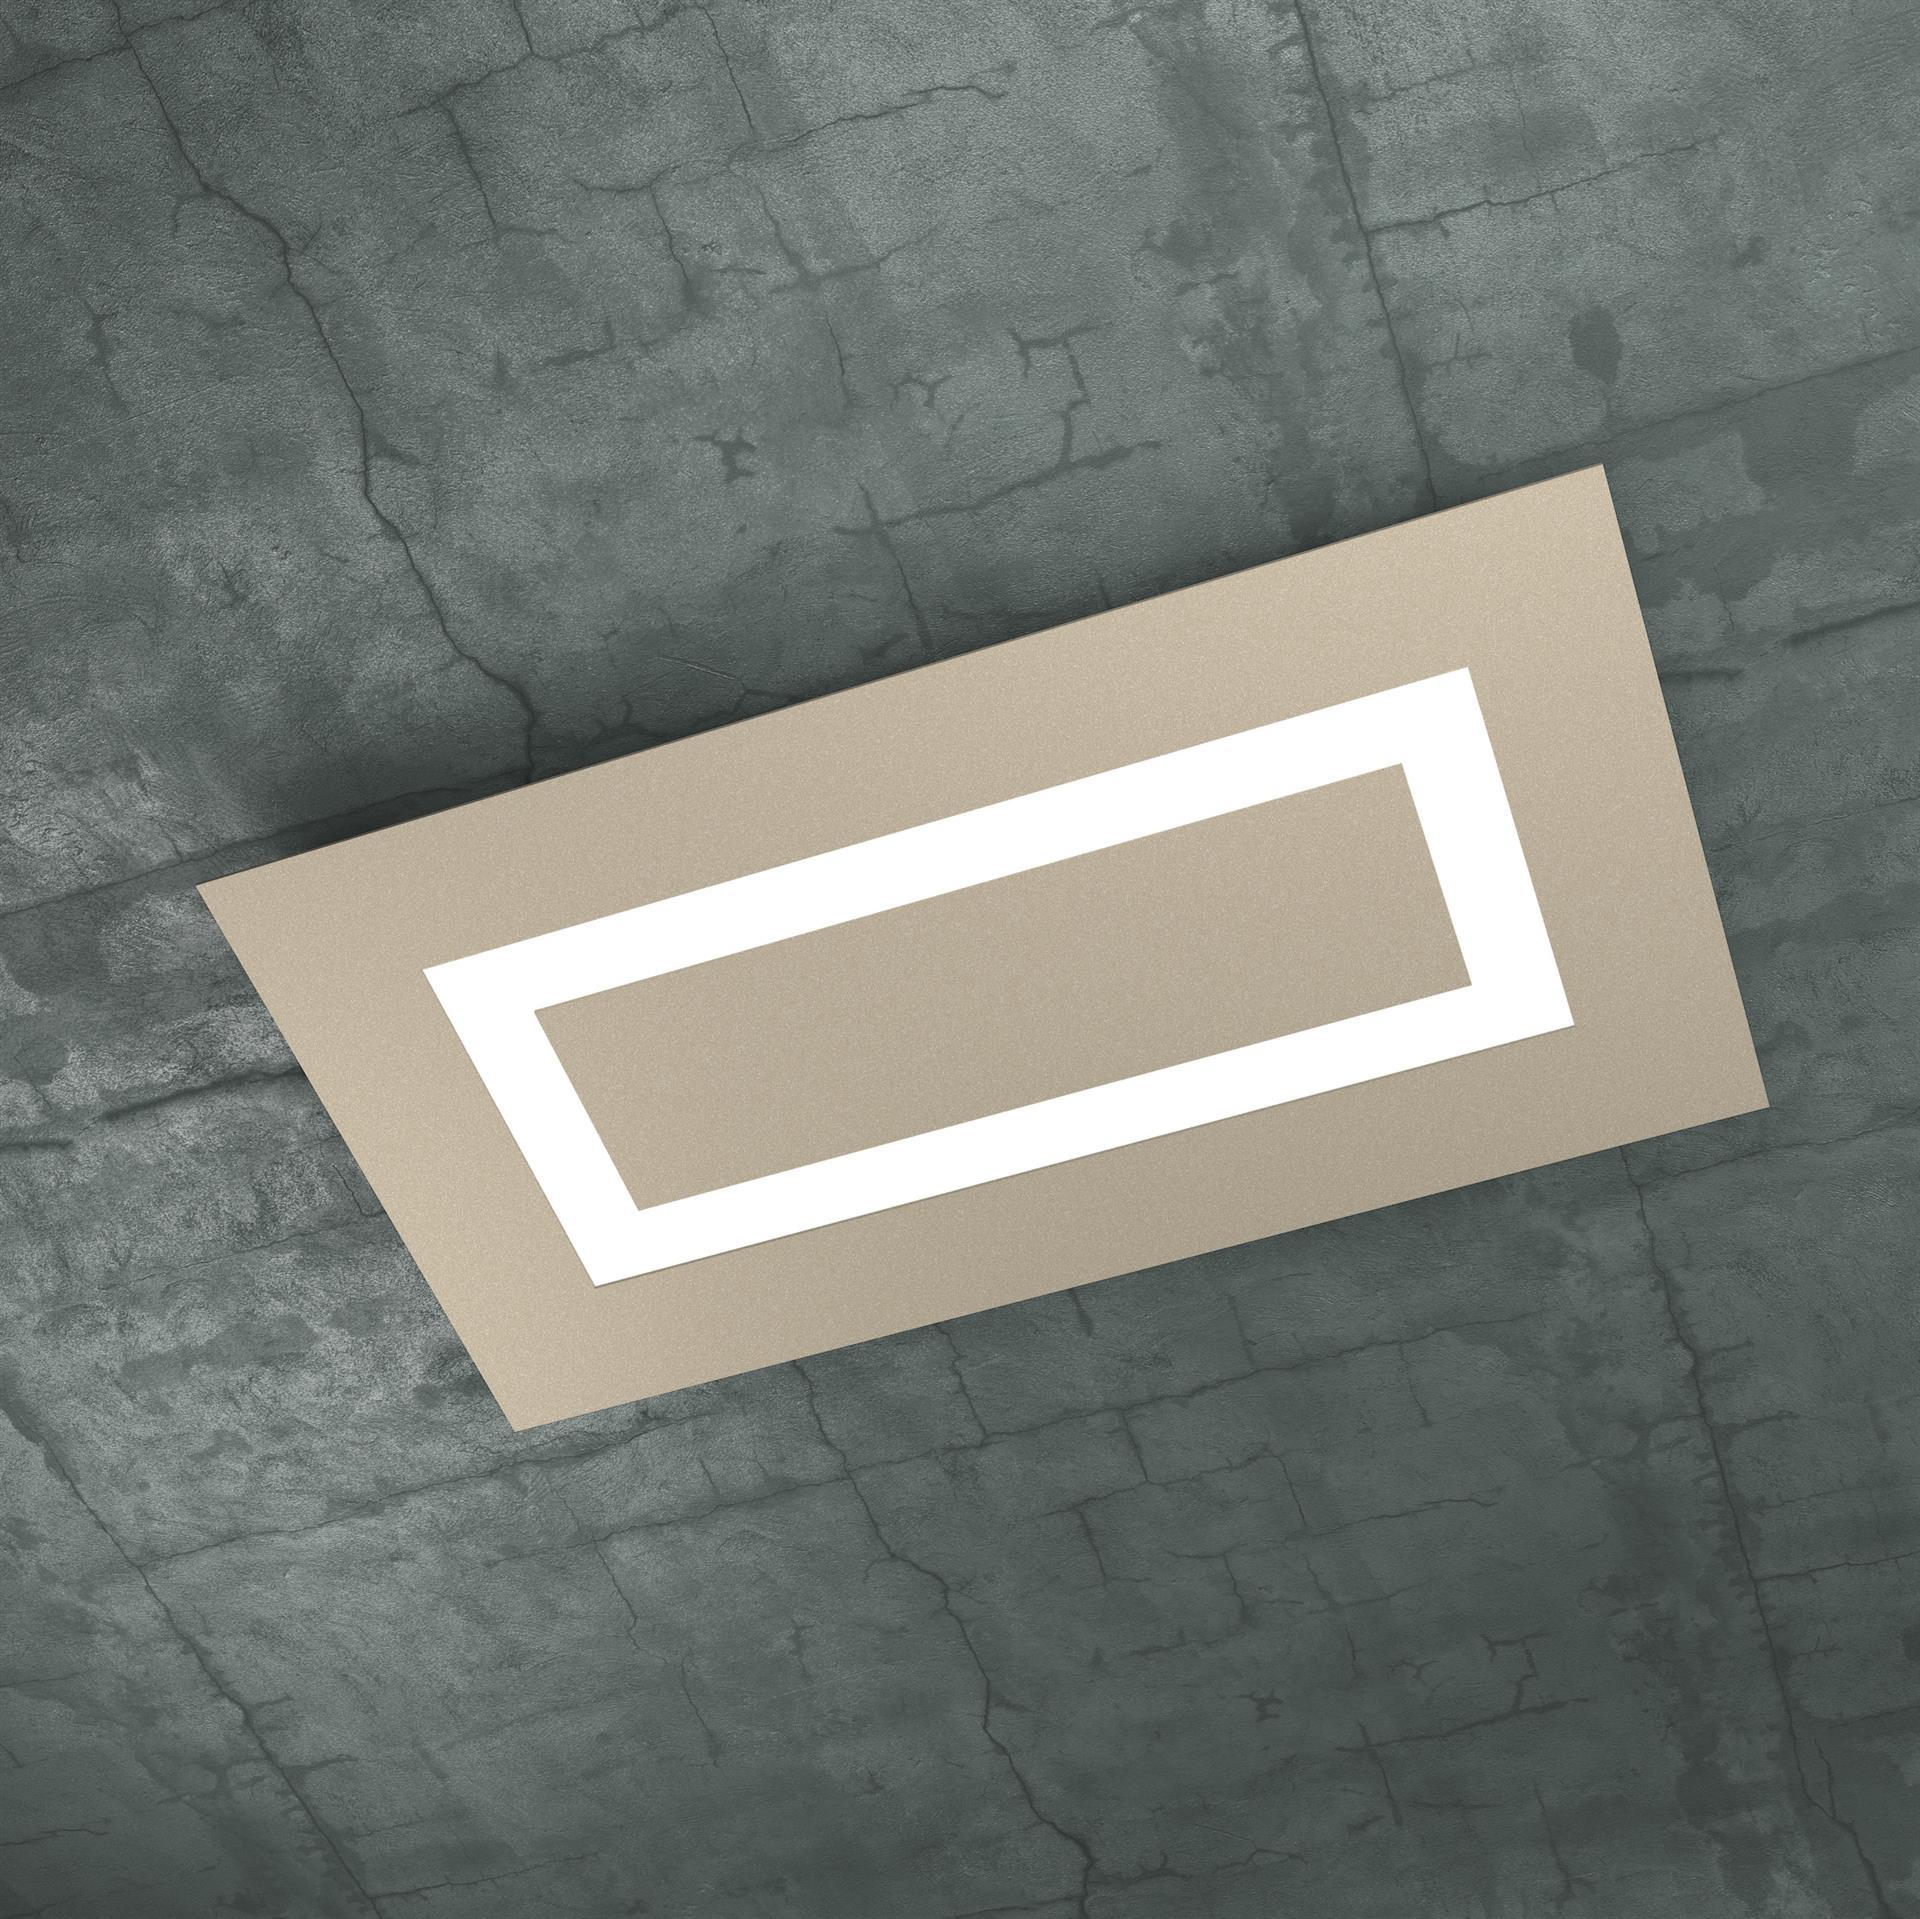 Plafoniera Moderna Led.Carpet Top Light Plafoniera Moderna Led 80w Sabbia